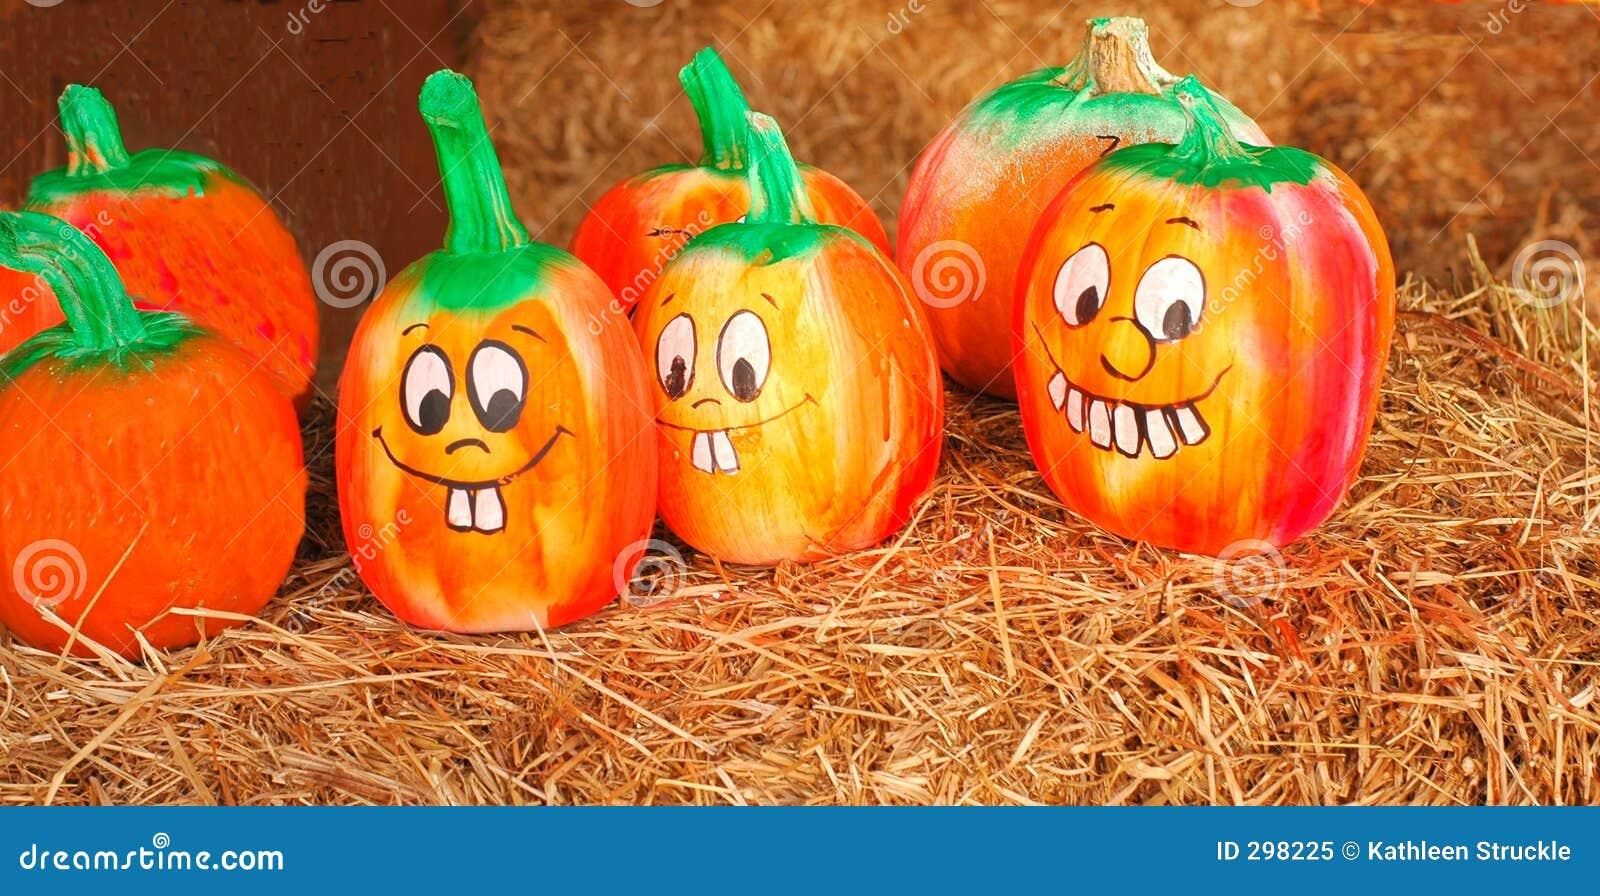 Calabazas pintadas imagen de archivo imagen de estacional 298225 - Calabazas de halloween pintadas ...